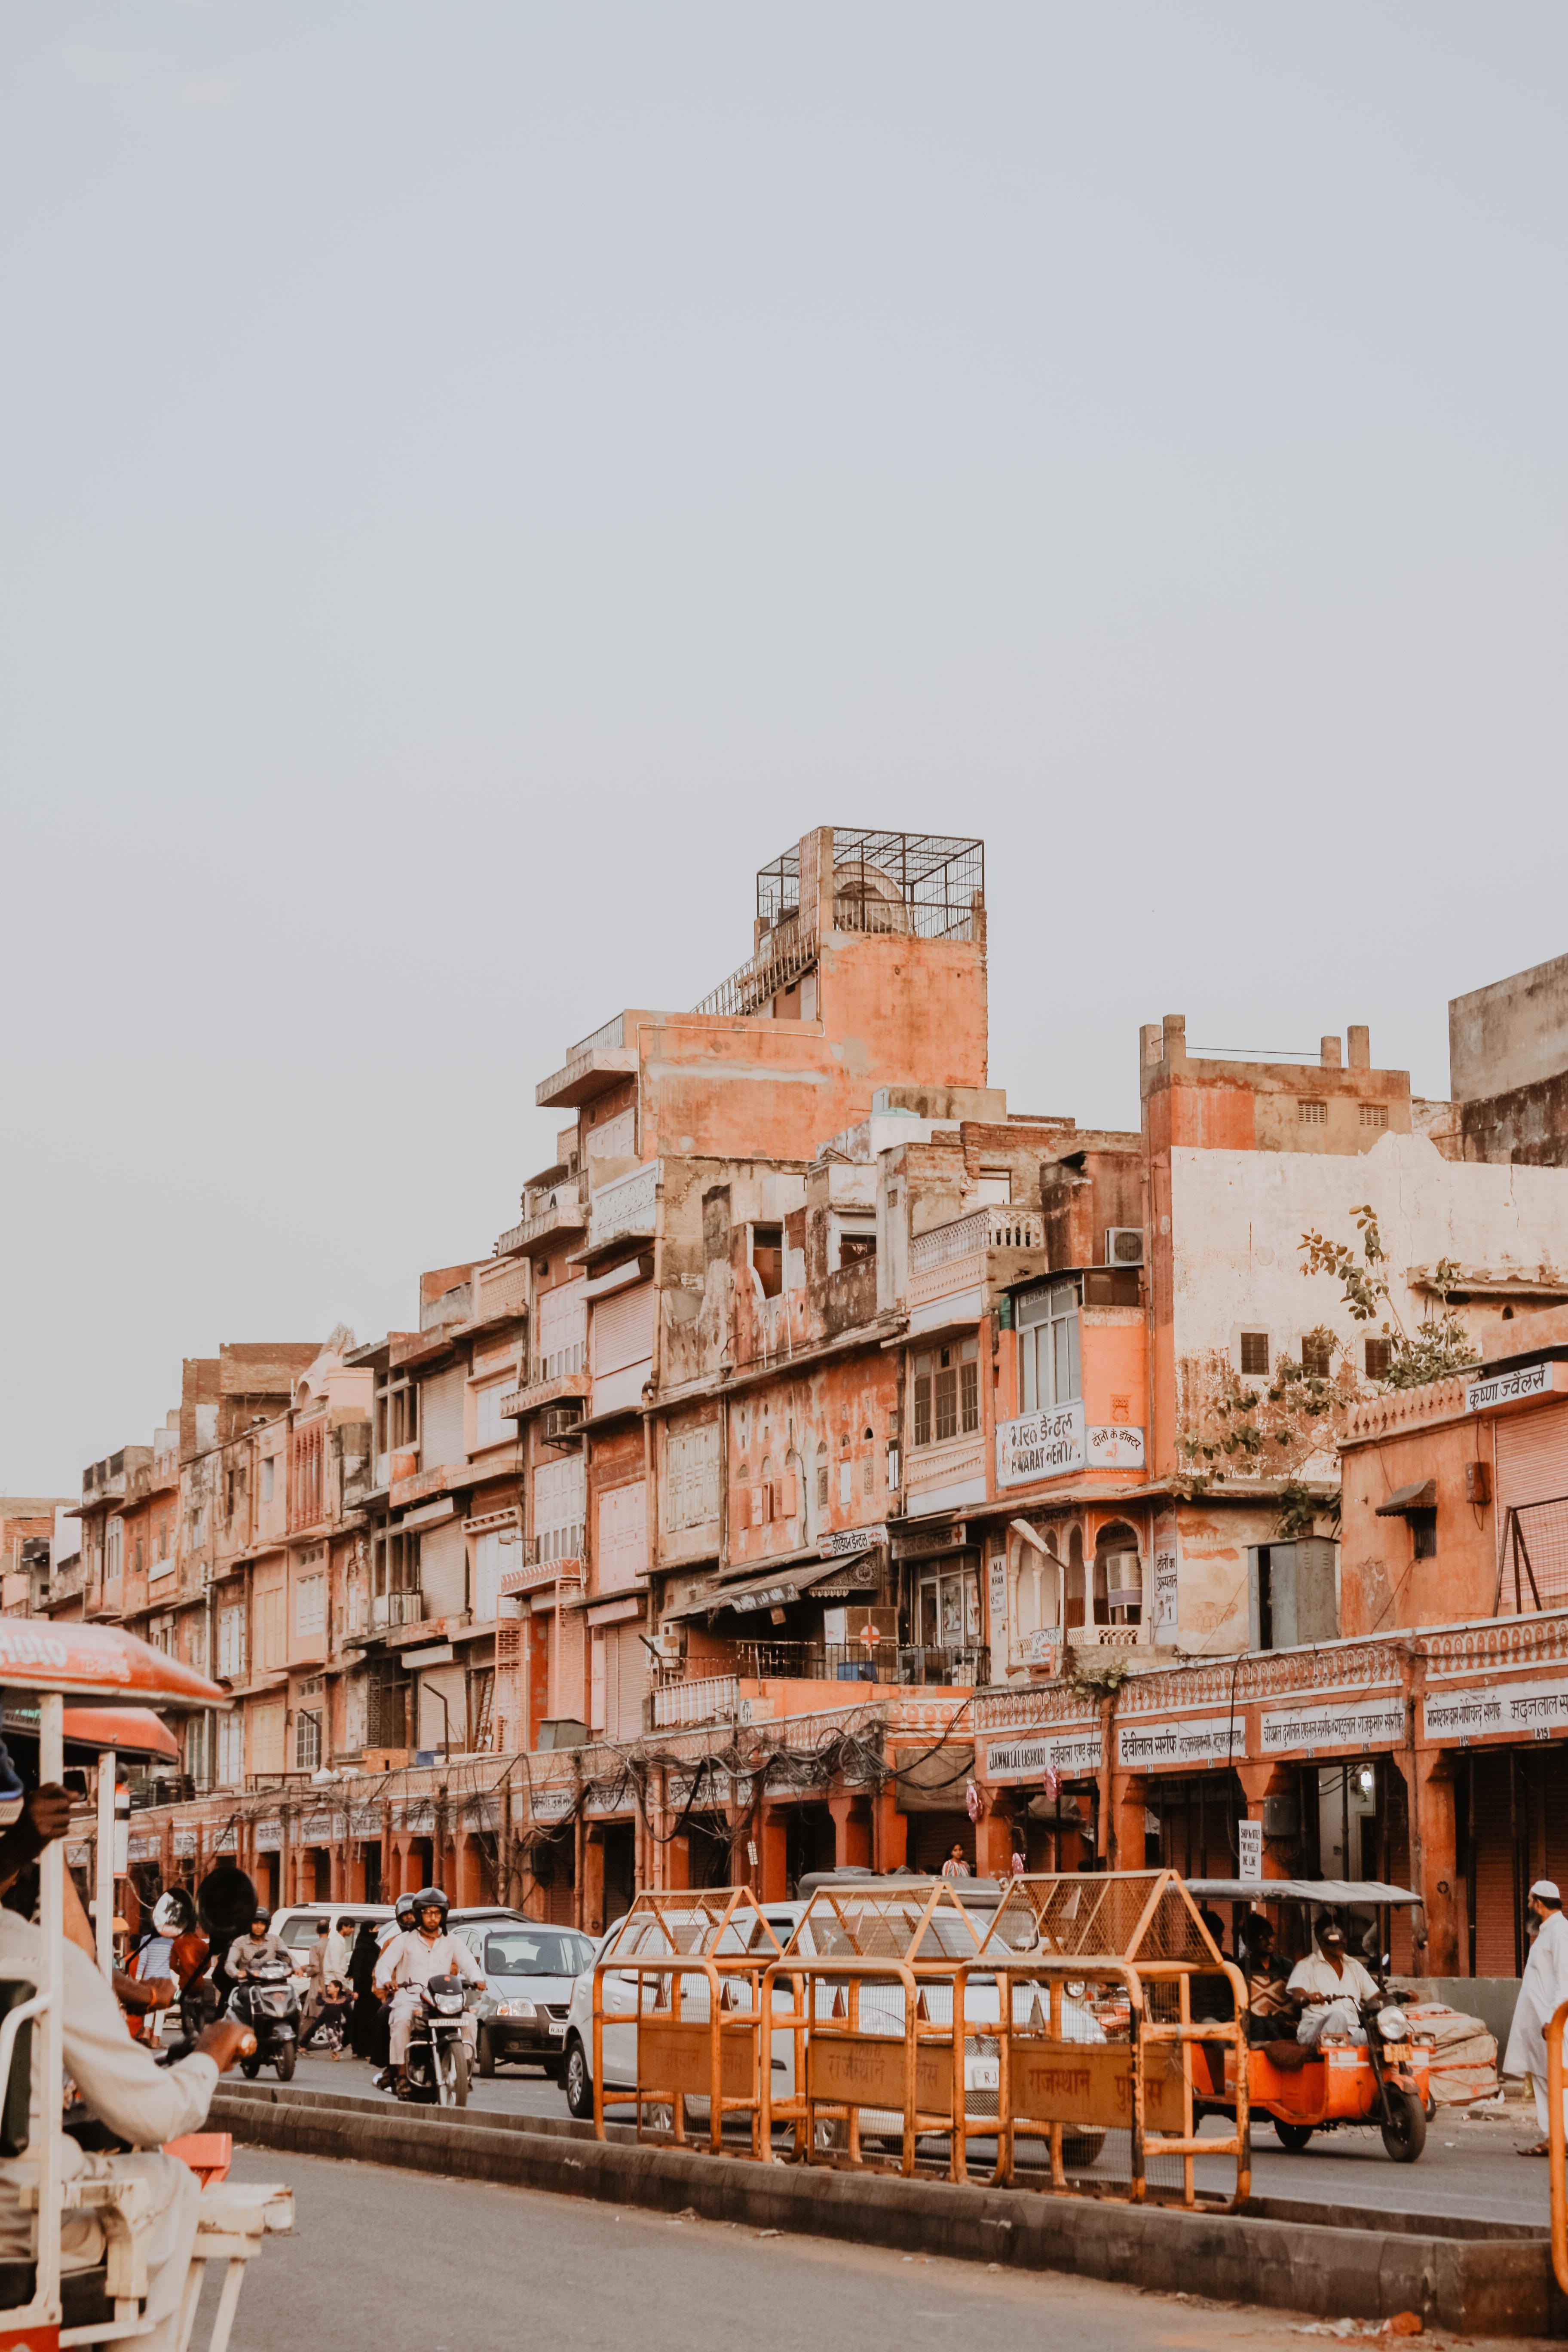 photo of orange building near road